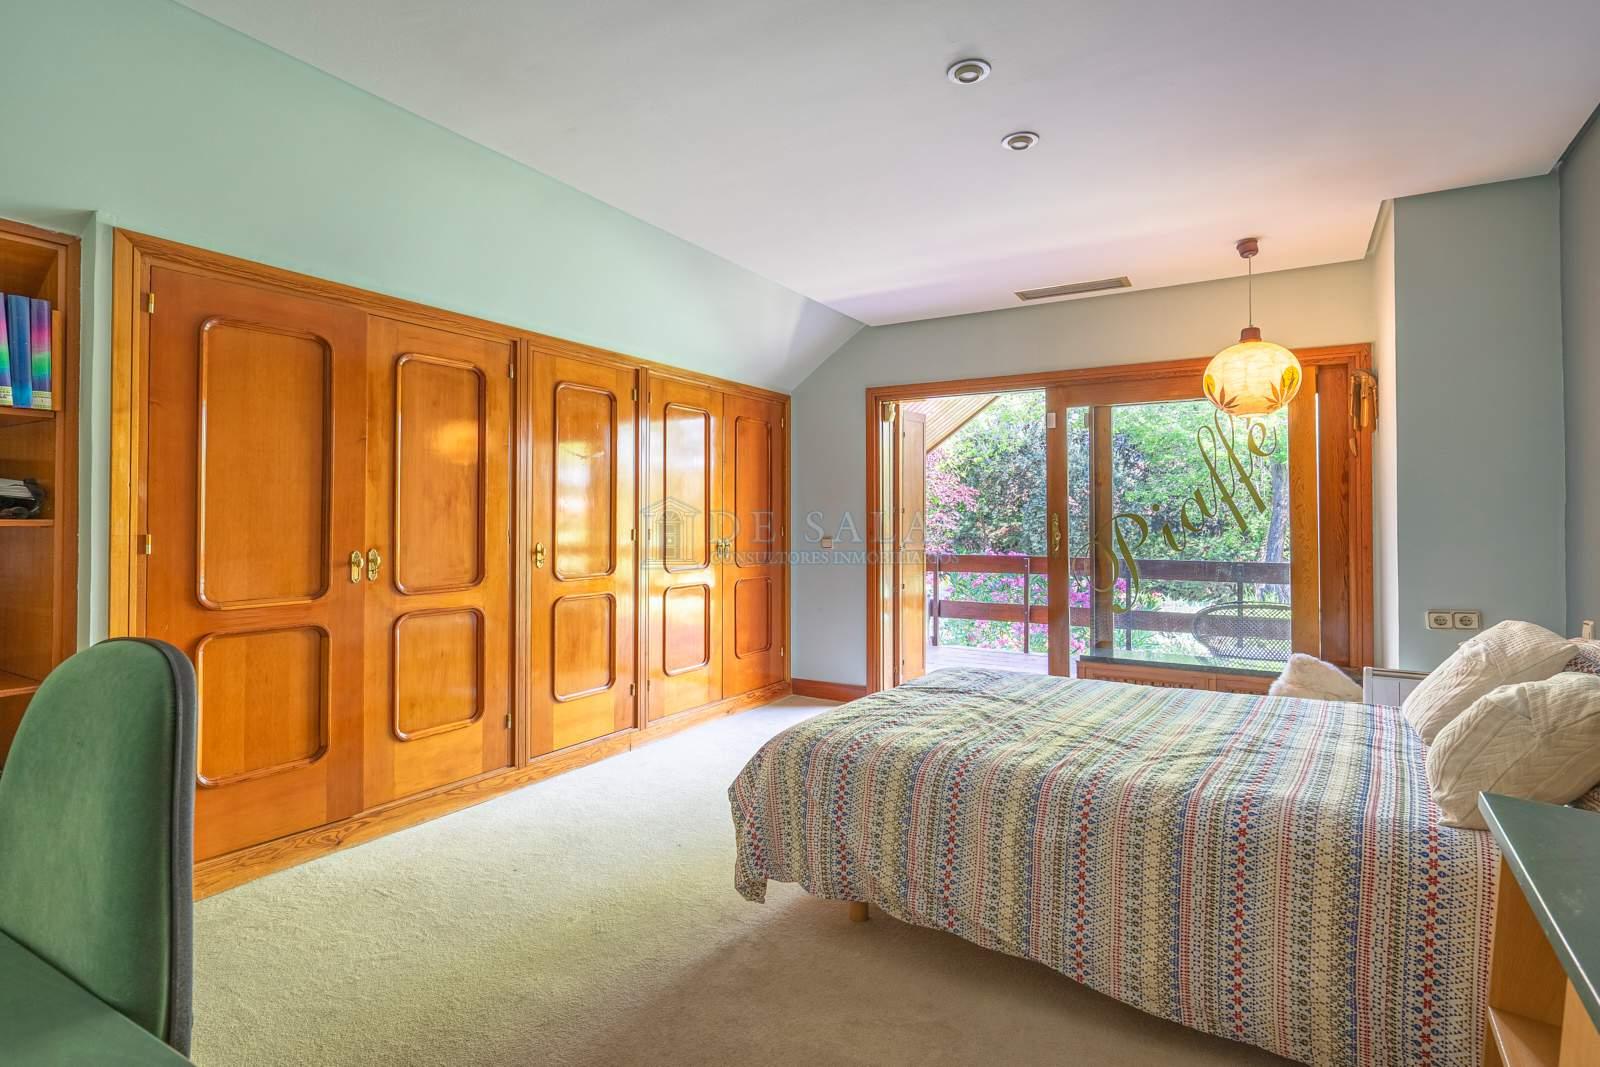 Dormitorio-33